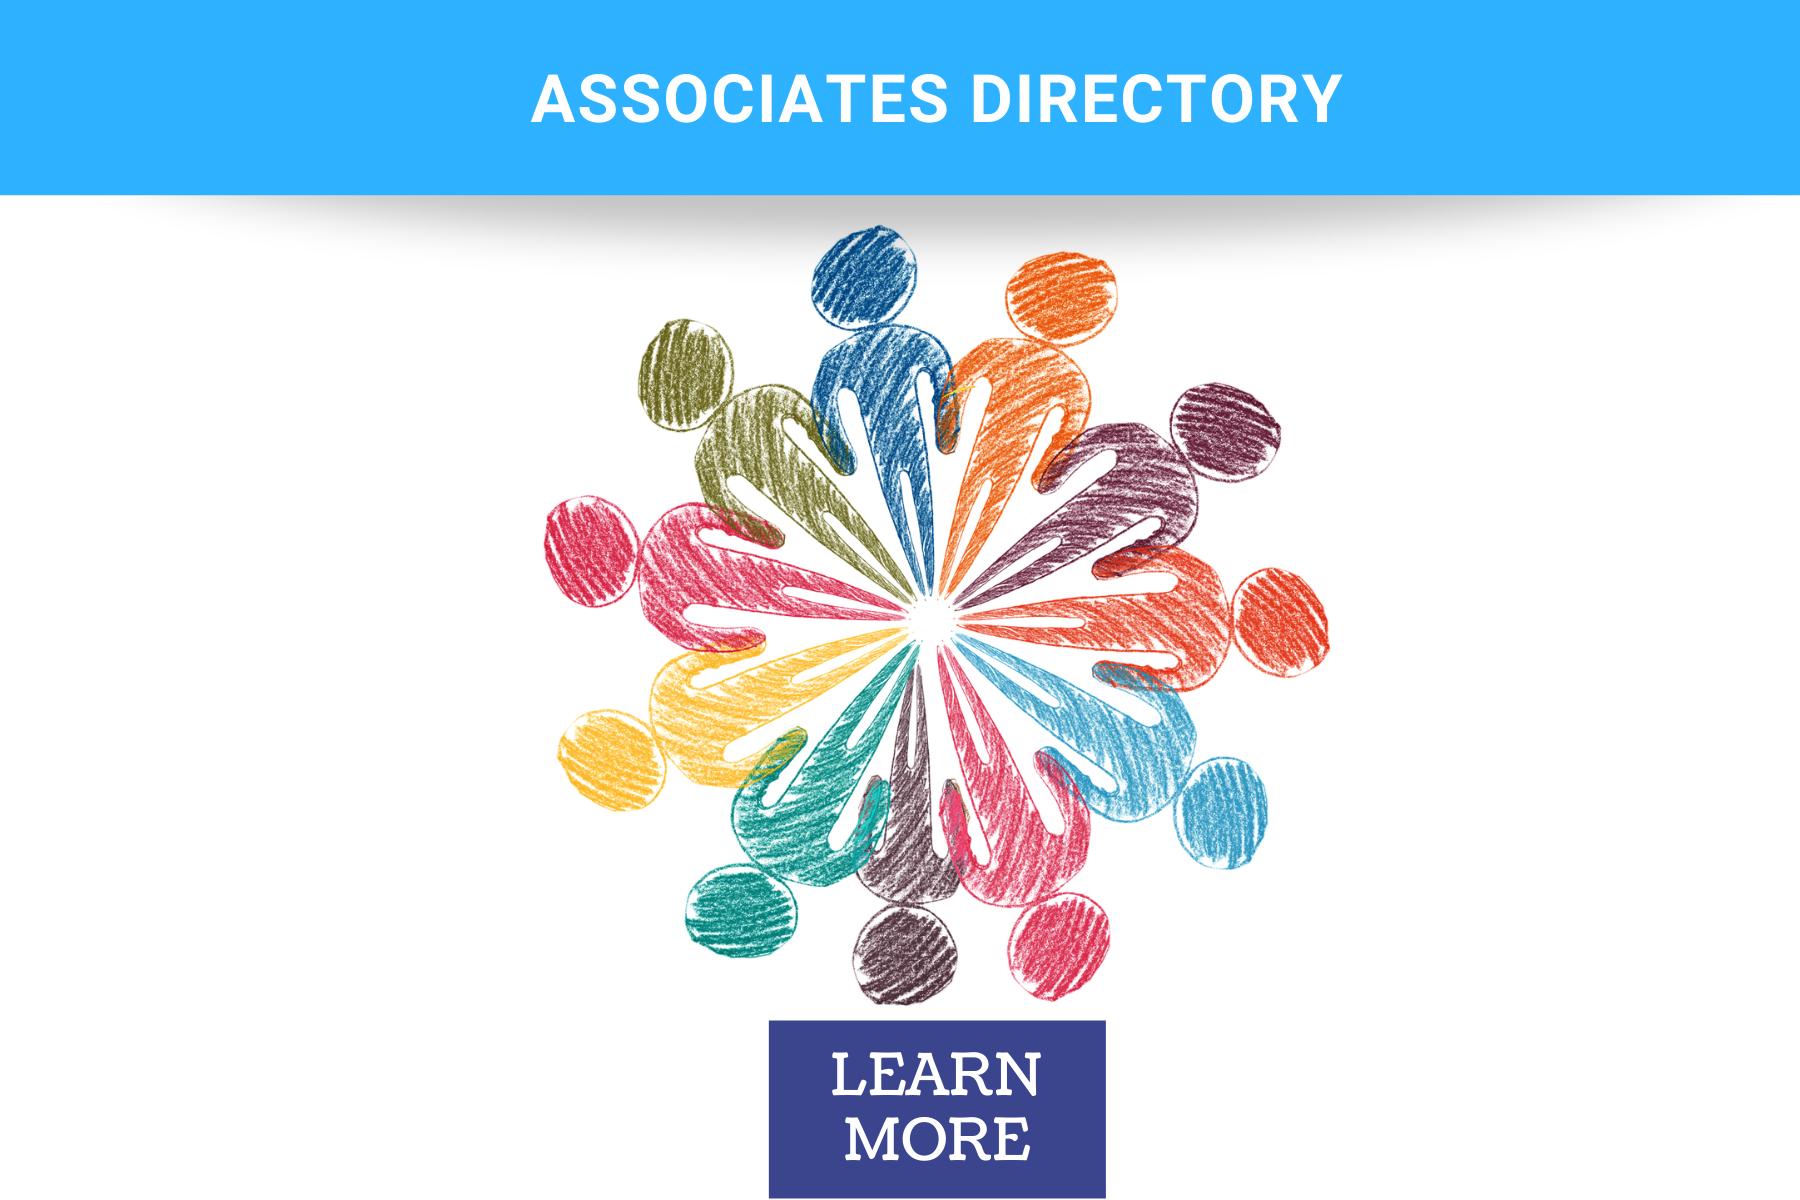 Associates_directory_button.png